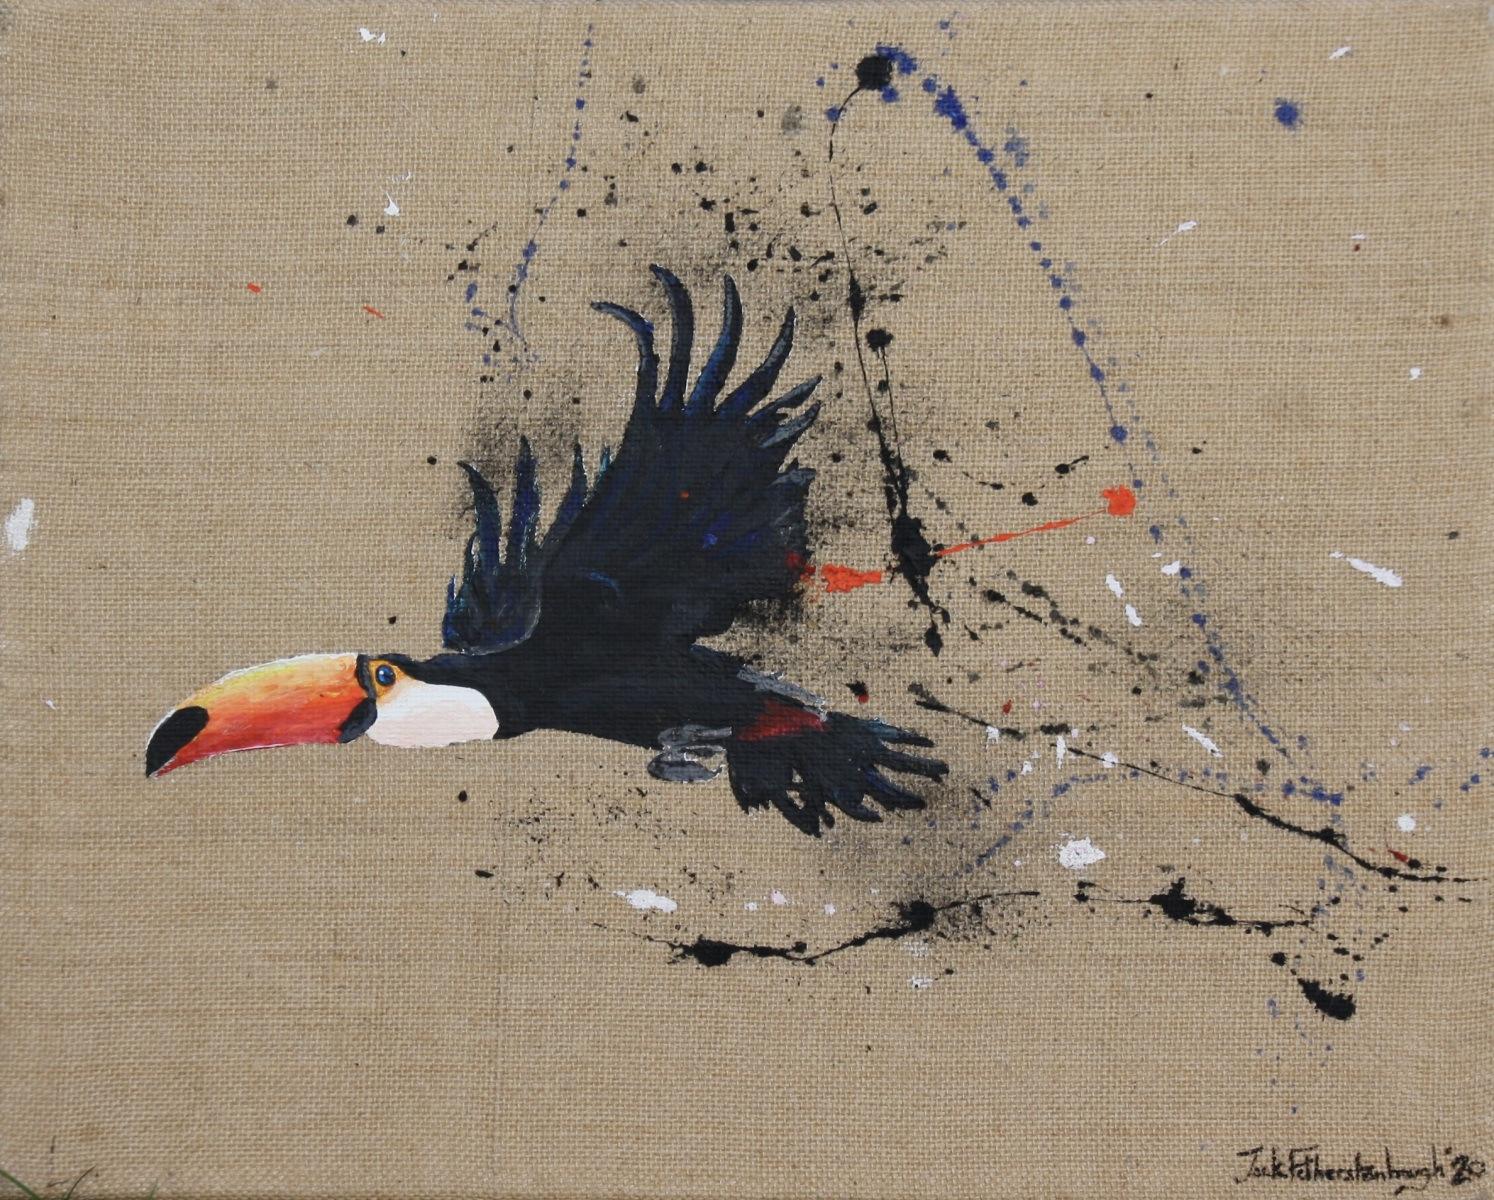 "JACK FETHERSTONHAUGH   TOUCAN   ACRYLIC ON HESSIAN   40 x 50cm   £1,050<br /><a class=""buy-button"" href=""mailto:info@dacre-art.com?subject=Website%20Enquiry"">Enquire</a>"